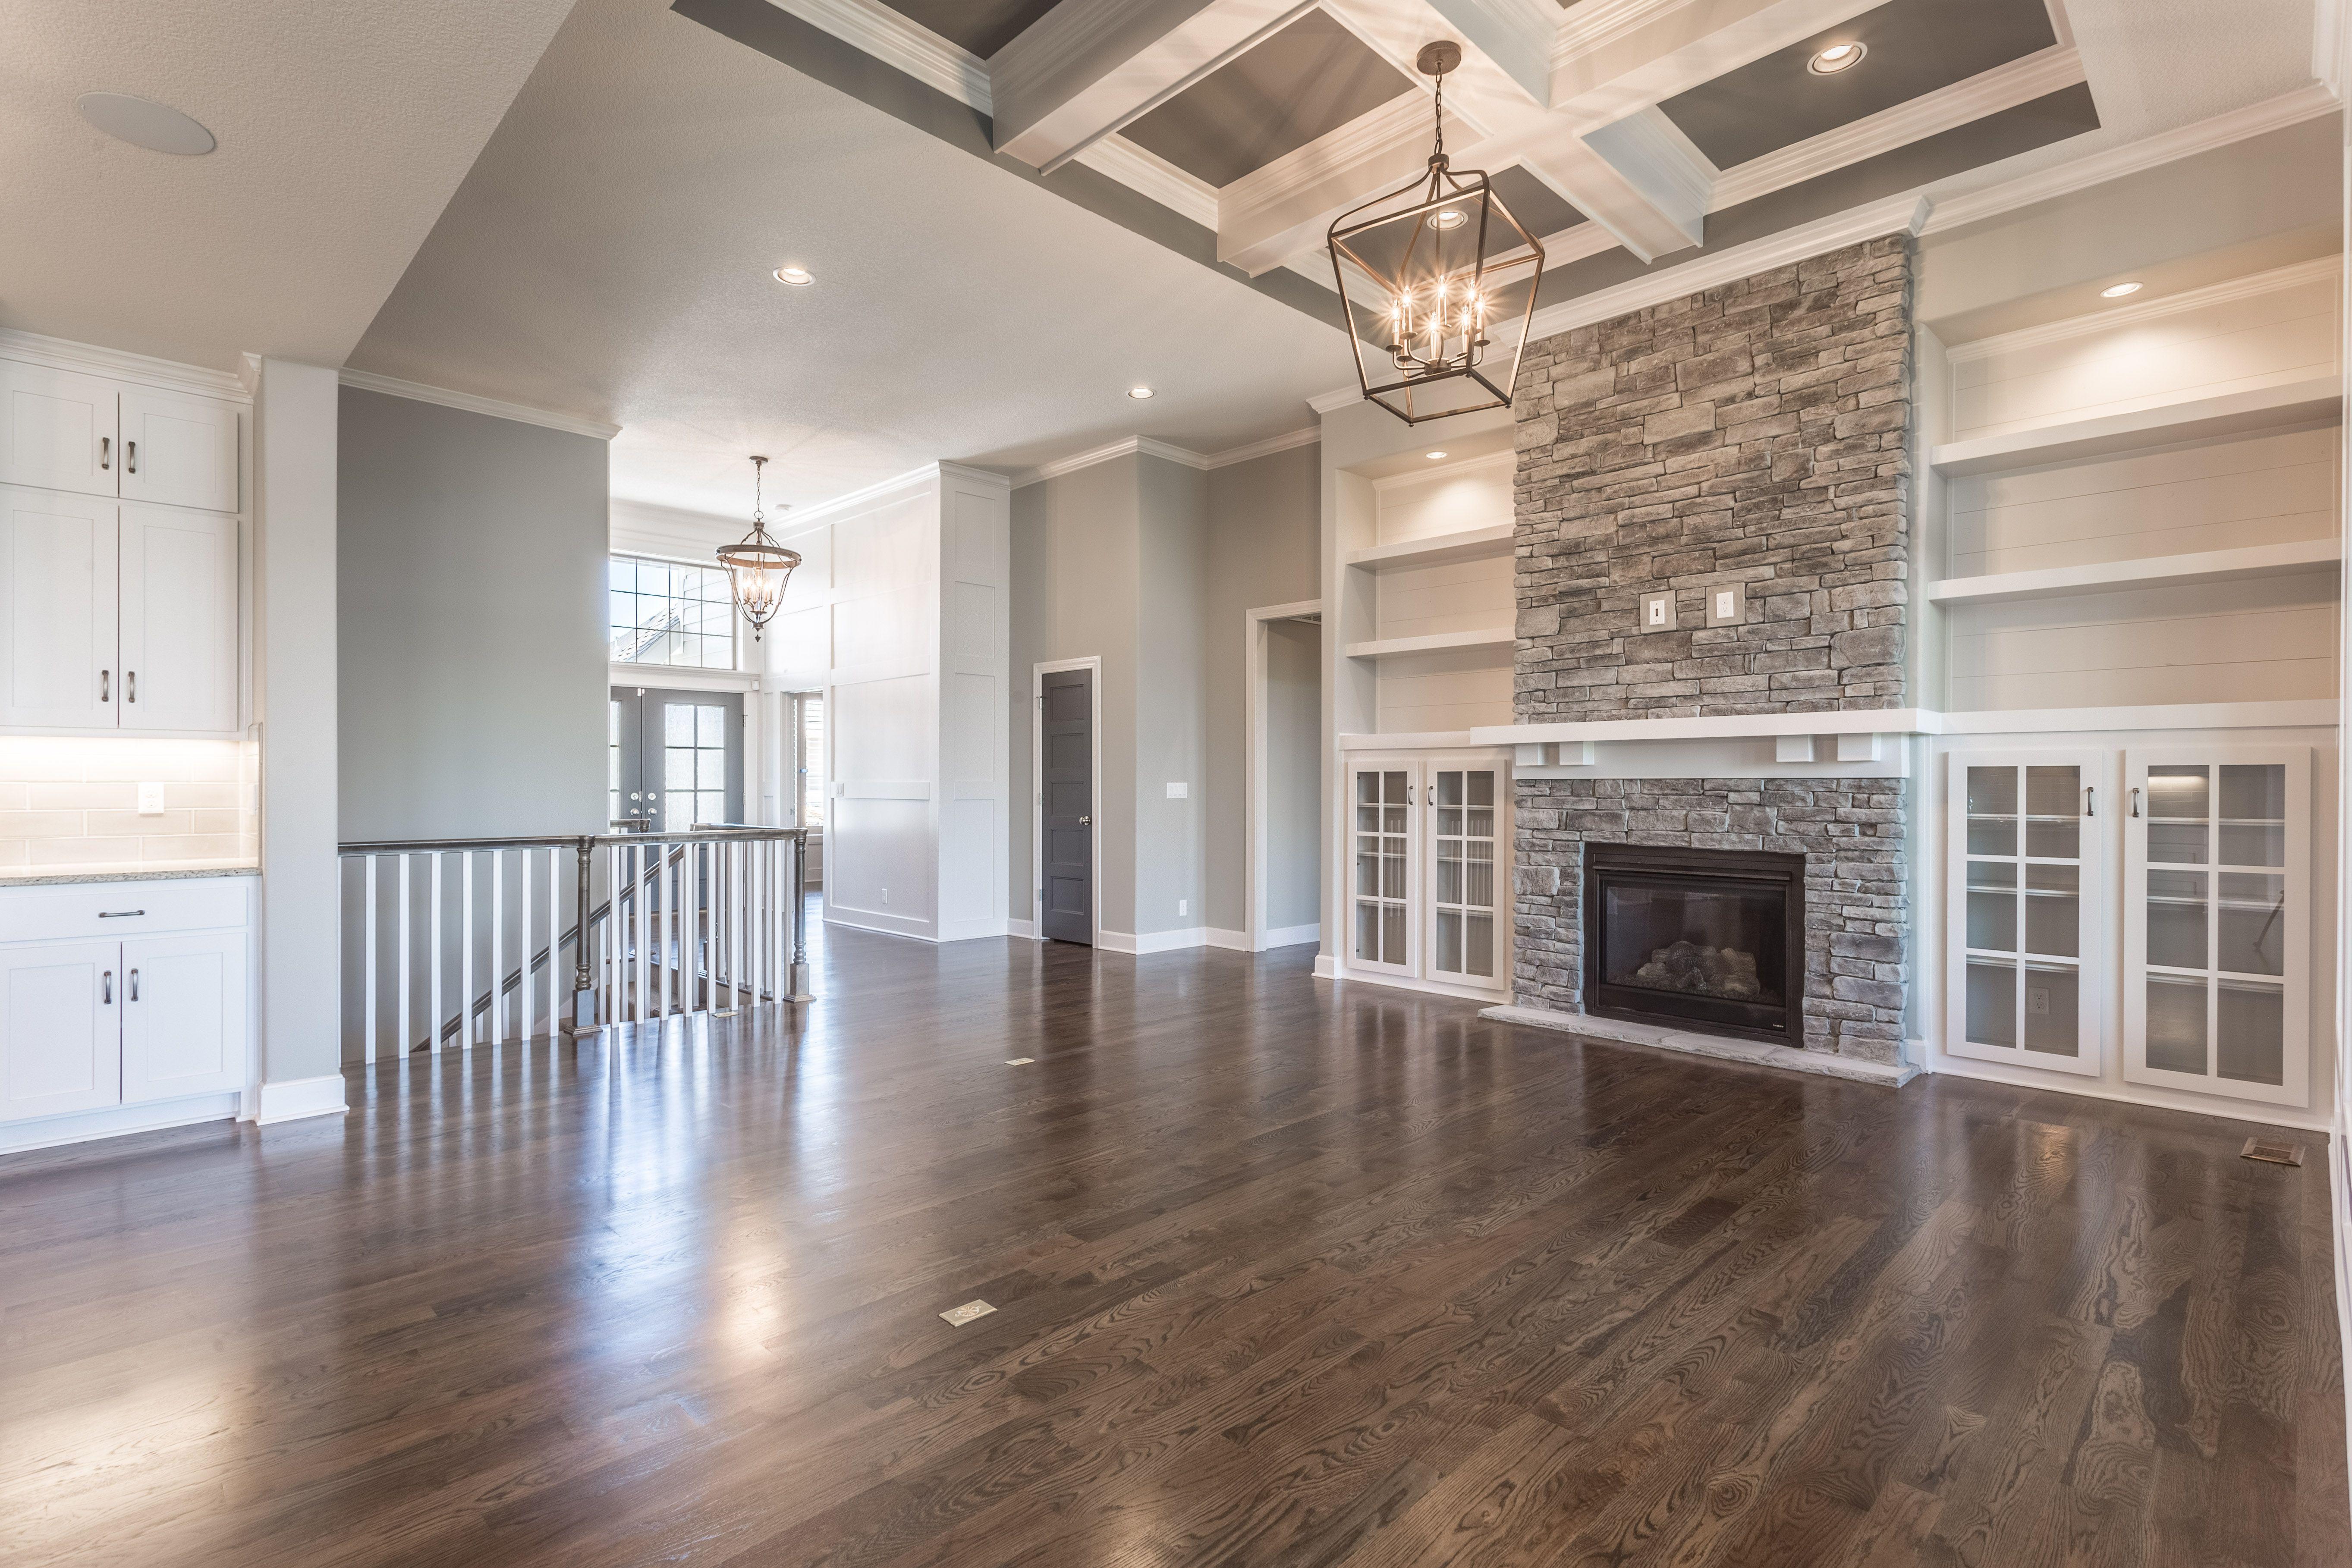 Reverse 1.5, Floorplan, Beams, Coffered Ceiling, Stone ...